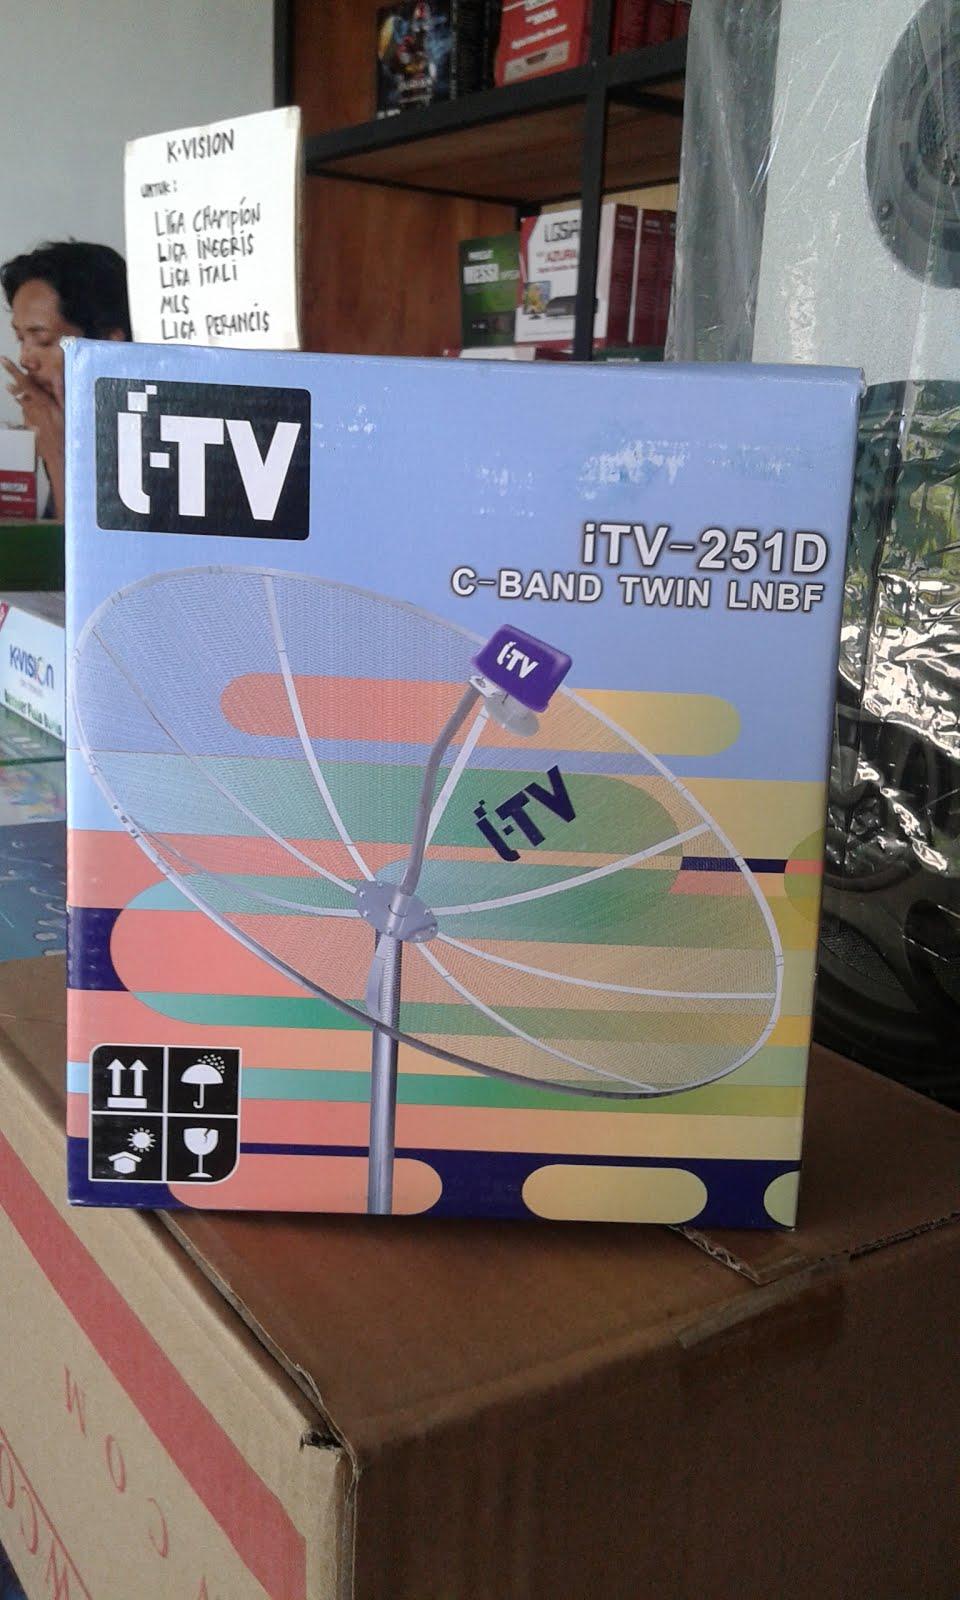 LNB ITV C-BAND